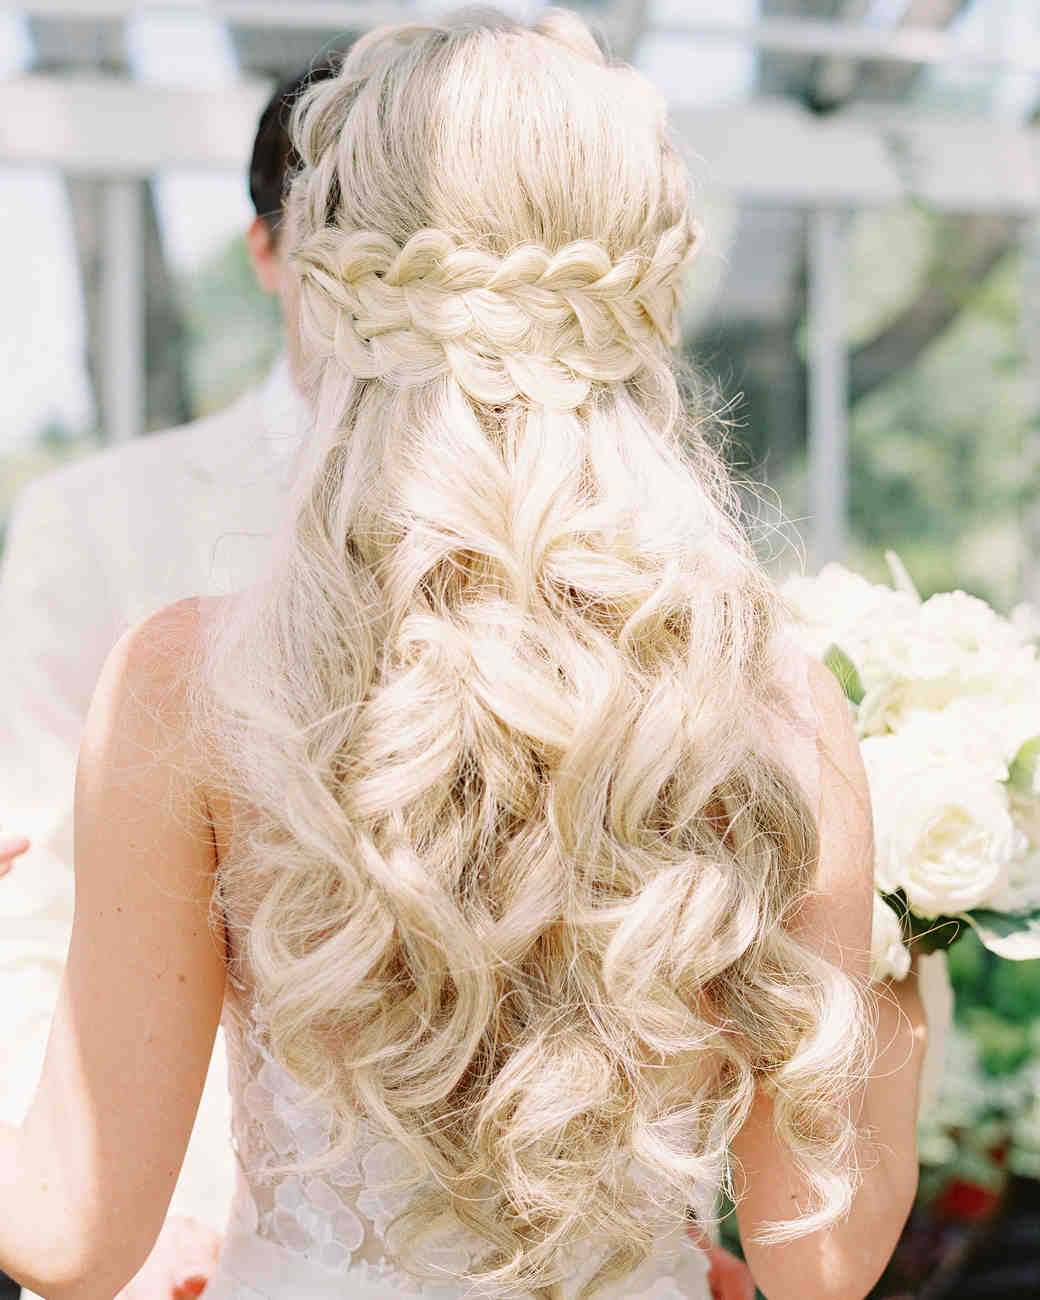 pics The Prettiest Half Up Half Down Wedding Hairstyles We've Ever Seen